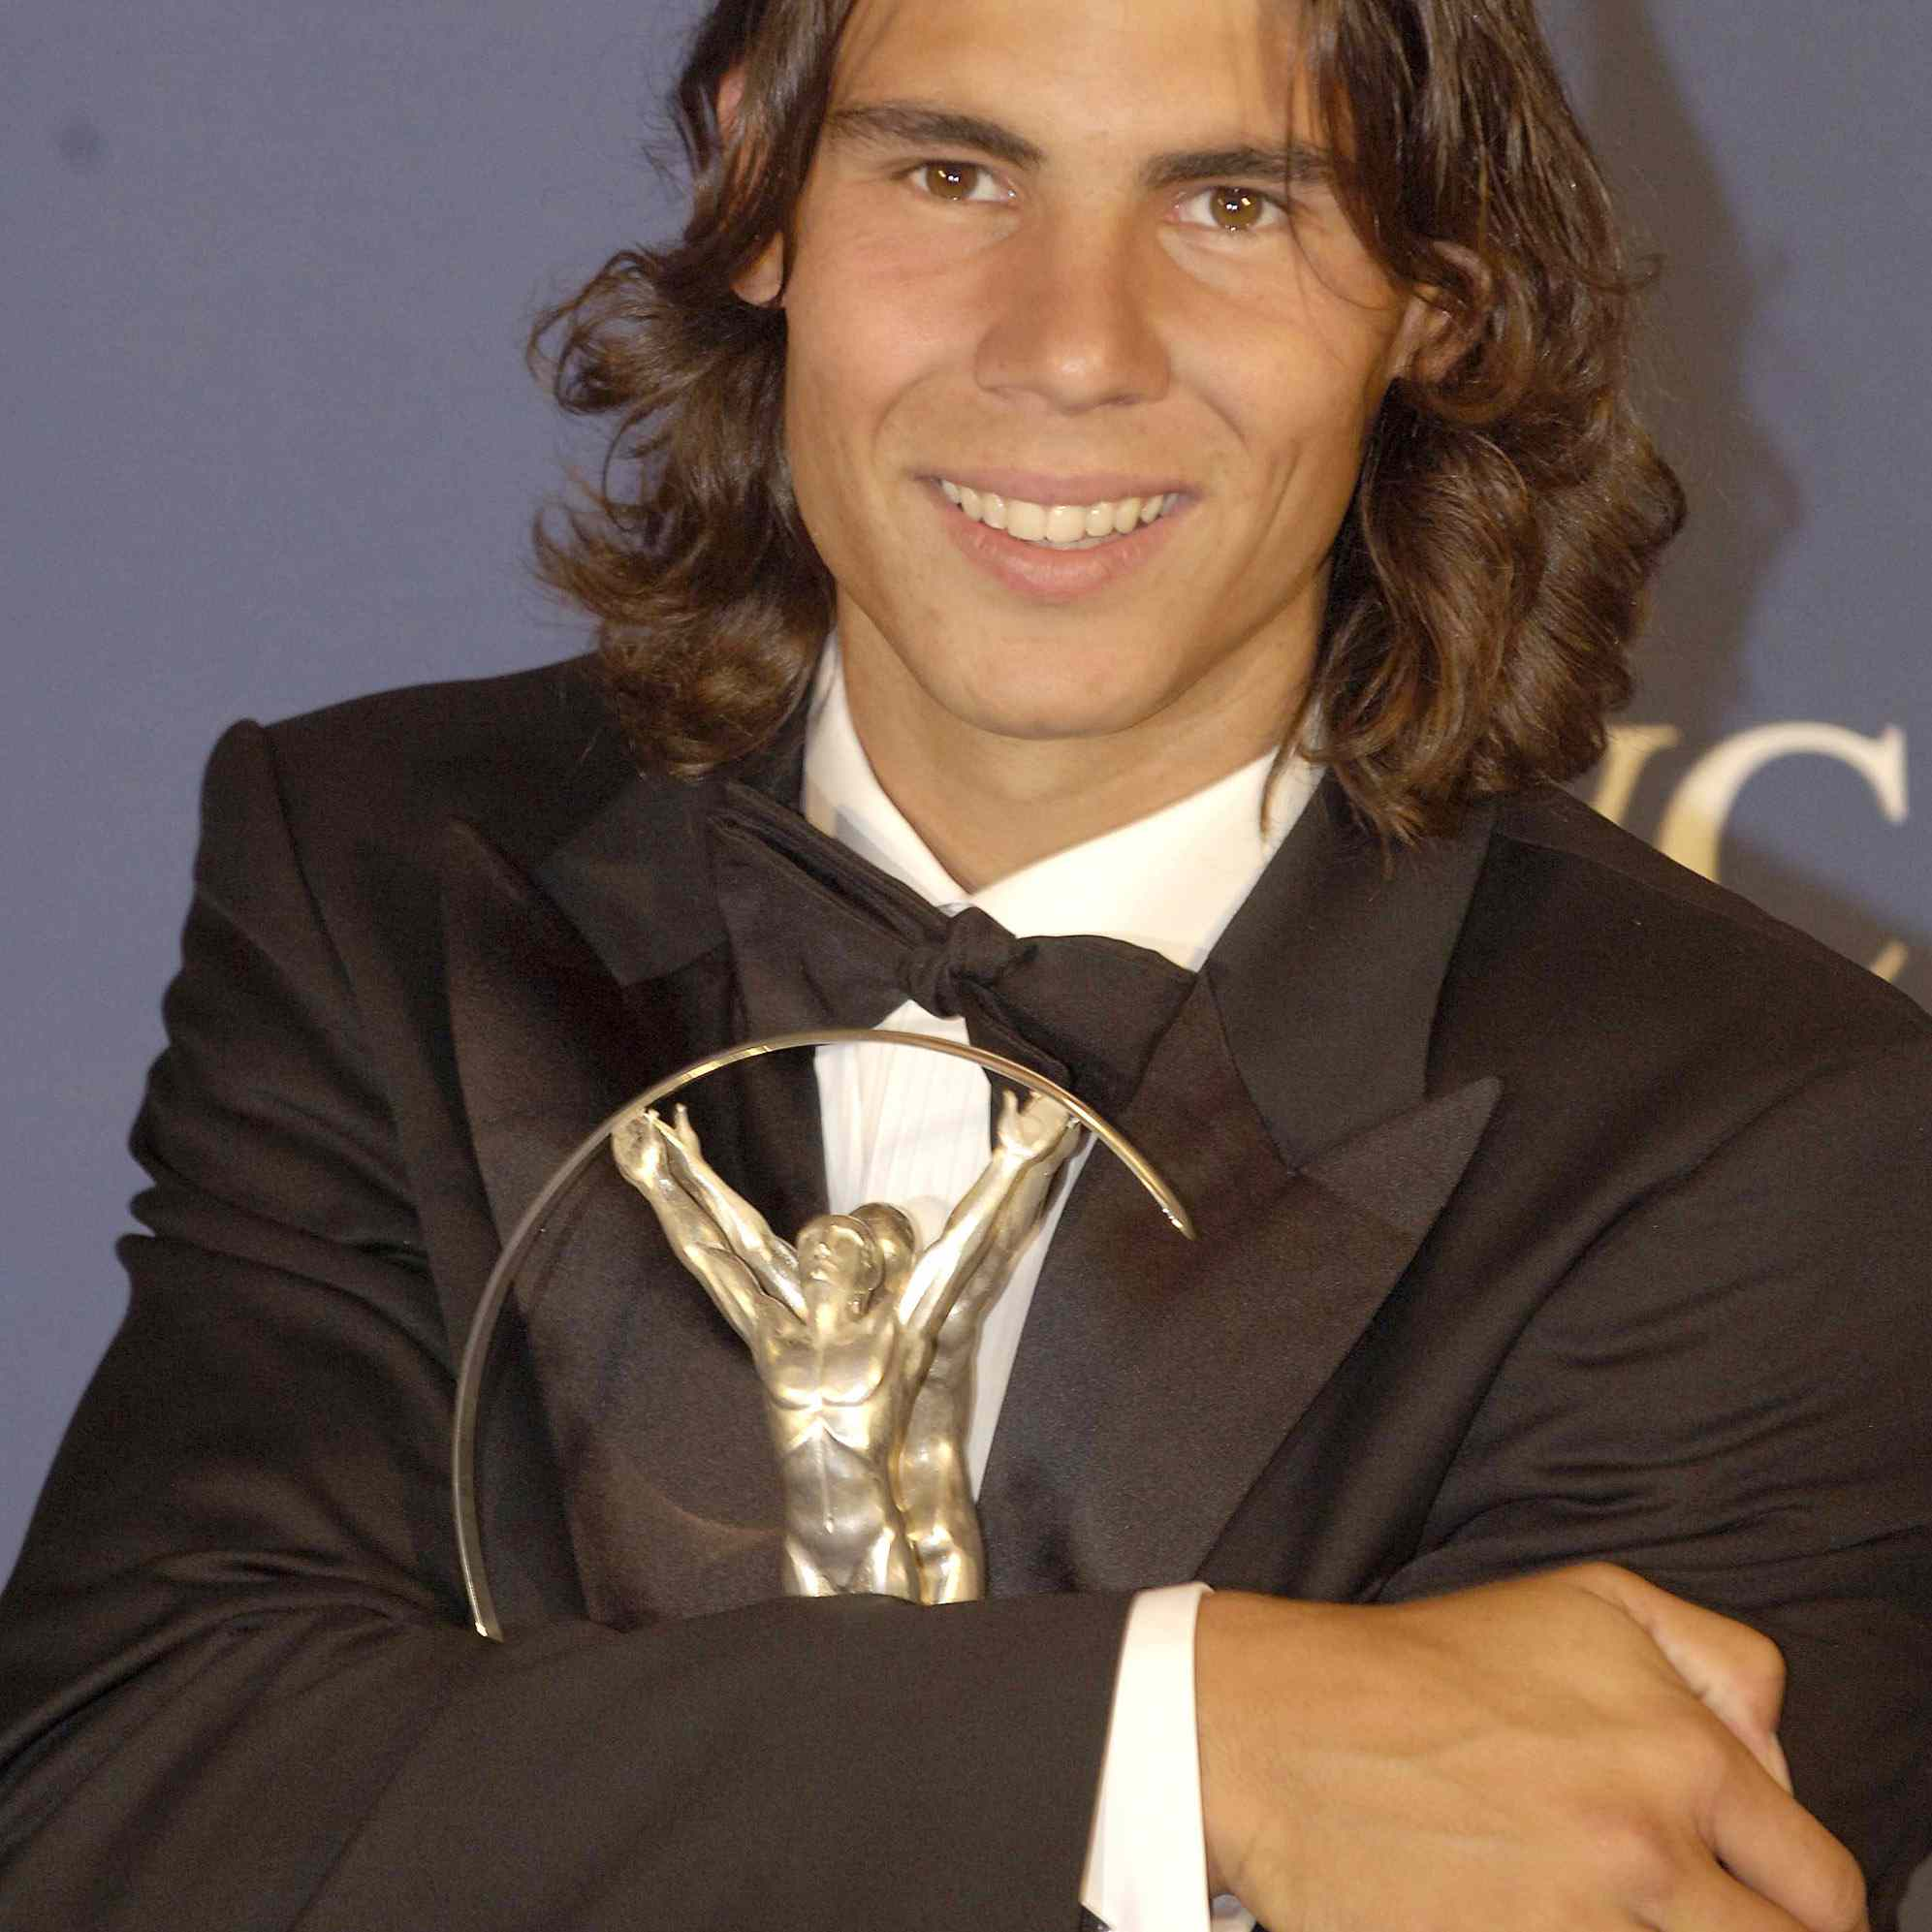 2006 Laureus World Sports Awards - Press Room